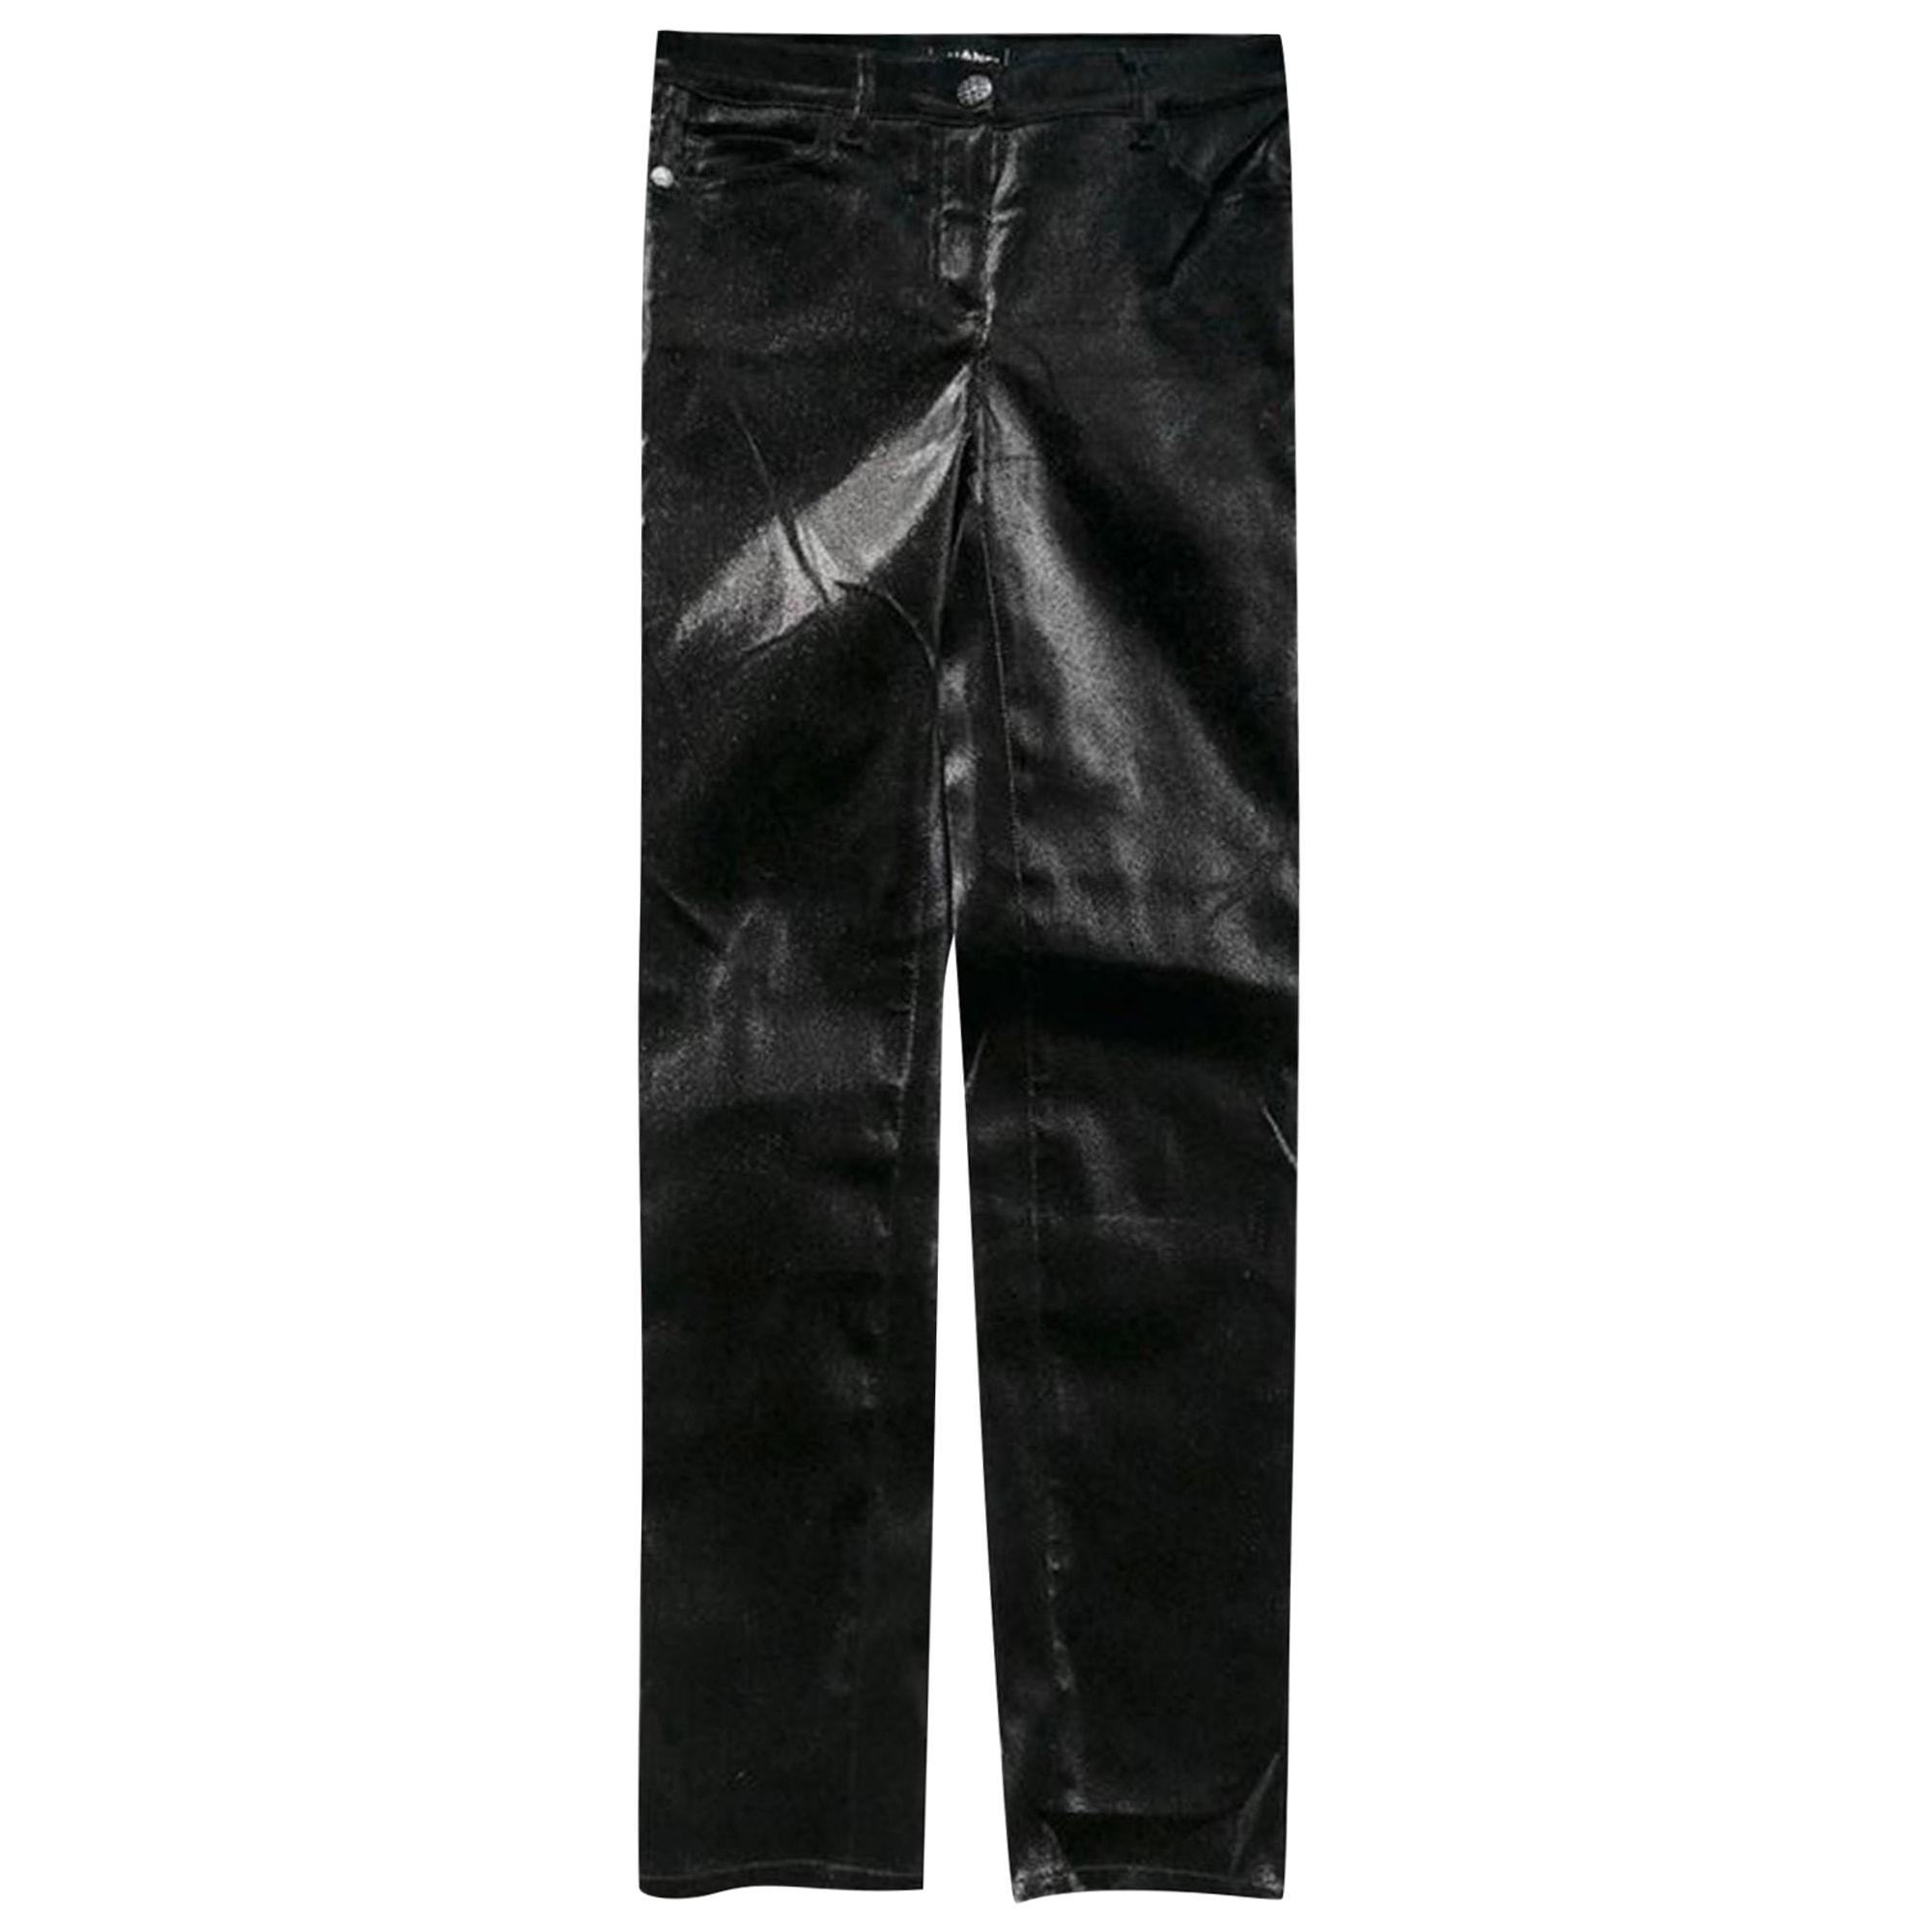 Pantalon slim, cigarette CHANEL Noir